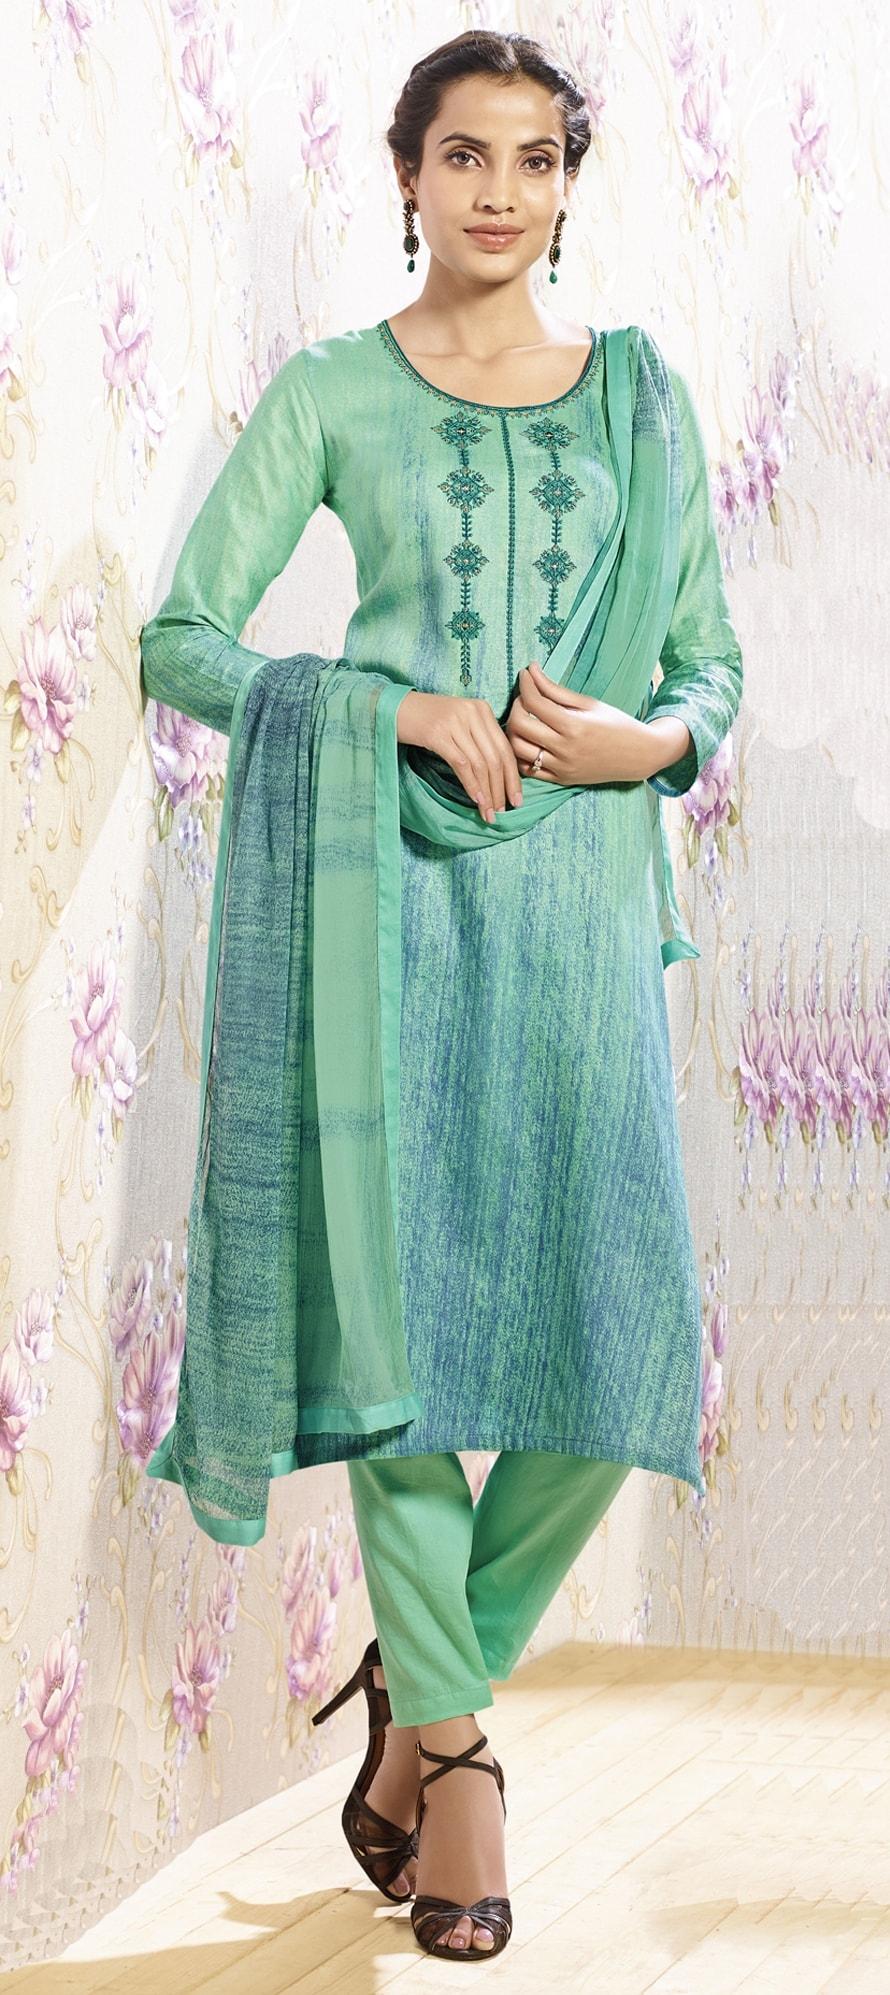 909565: Green color family unstitched Pakistani Salwar Kameez, Party ...